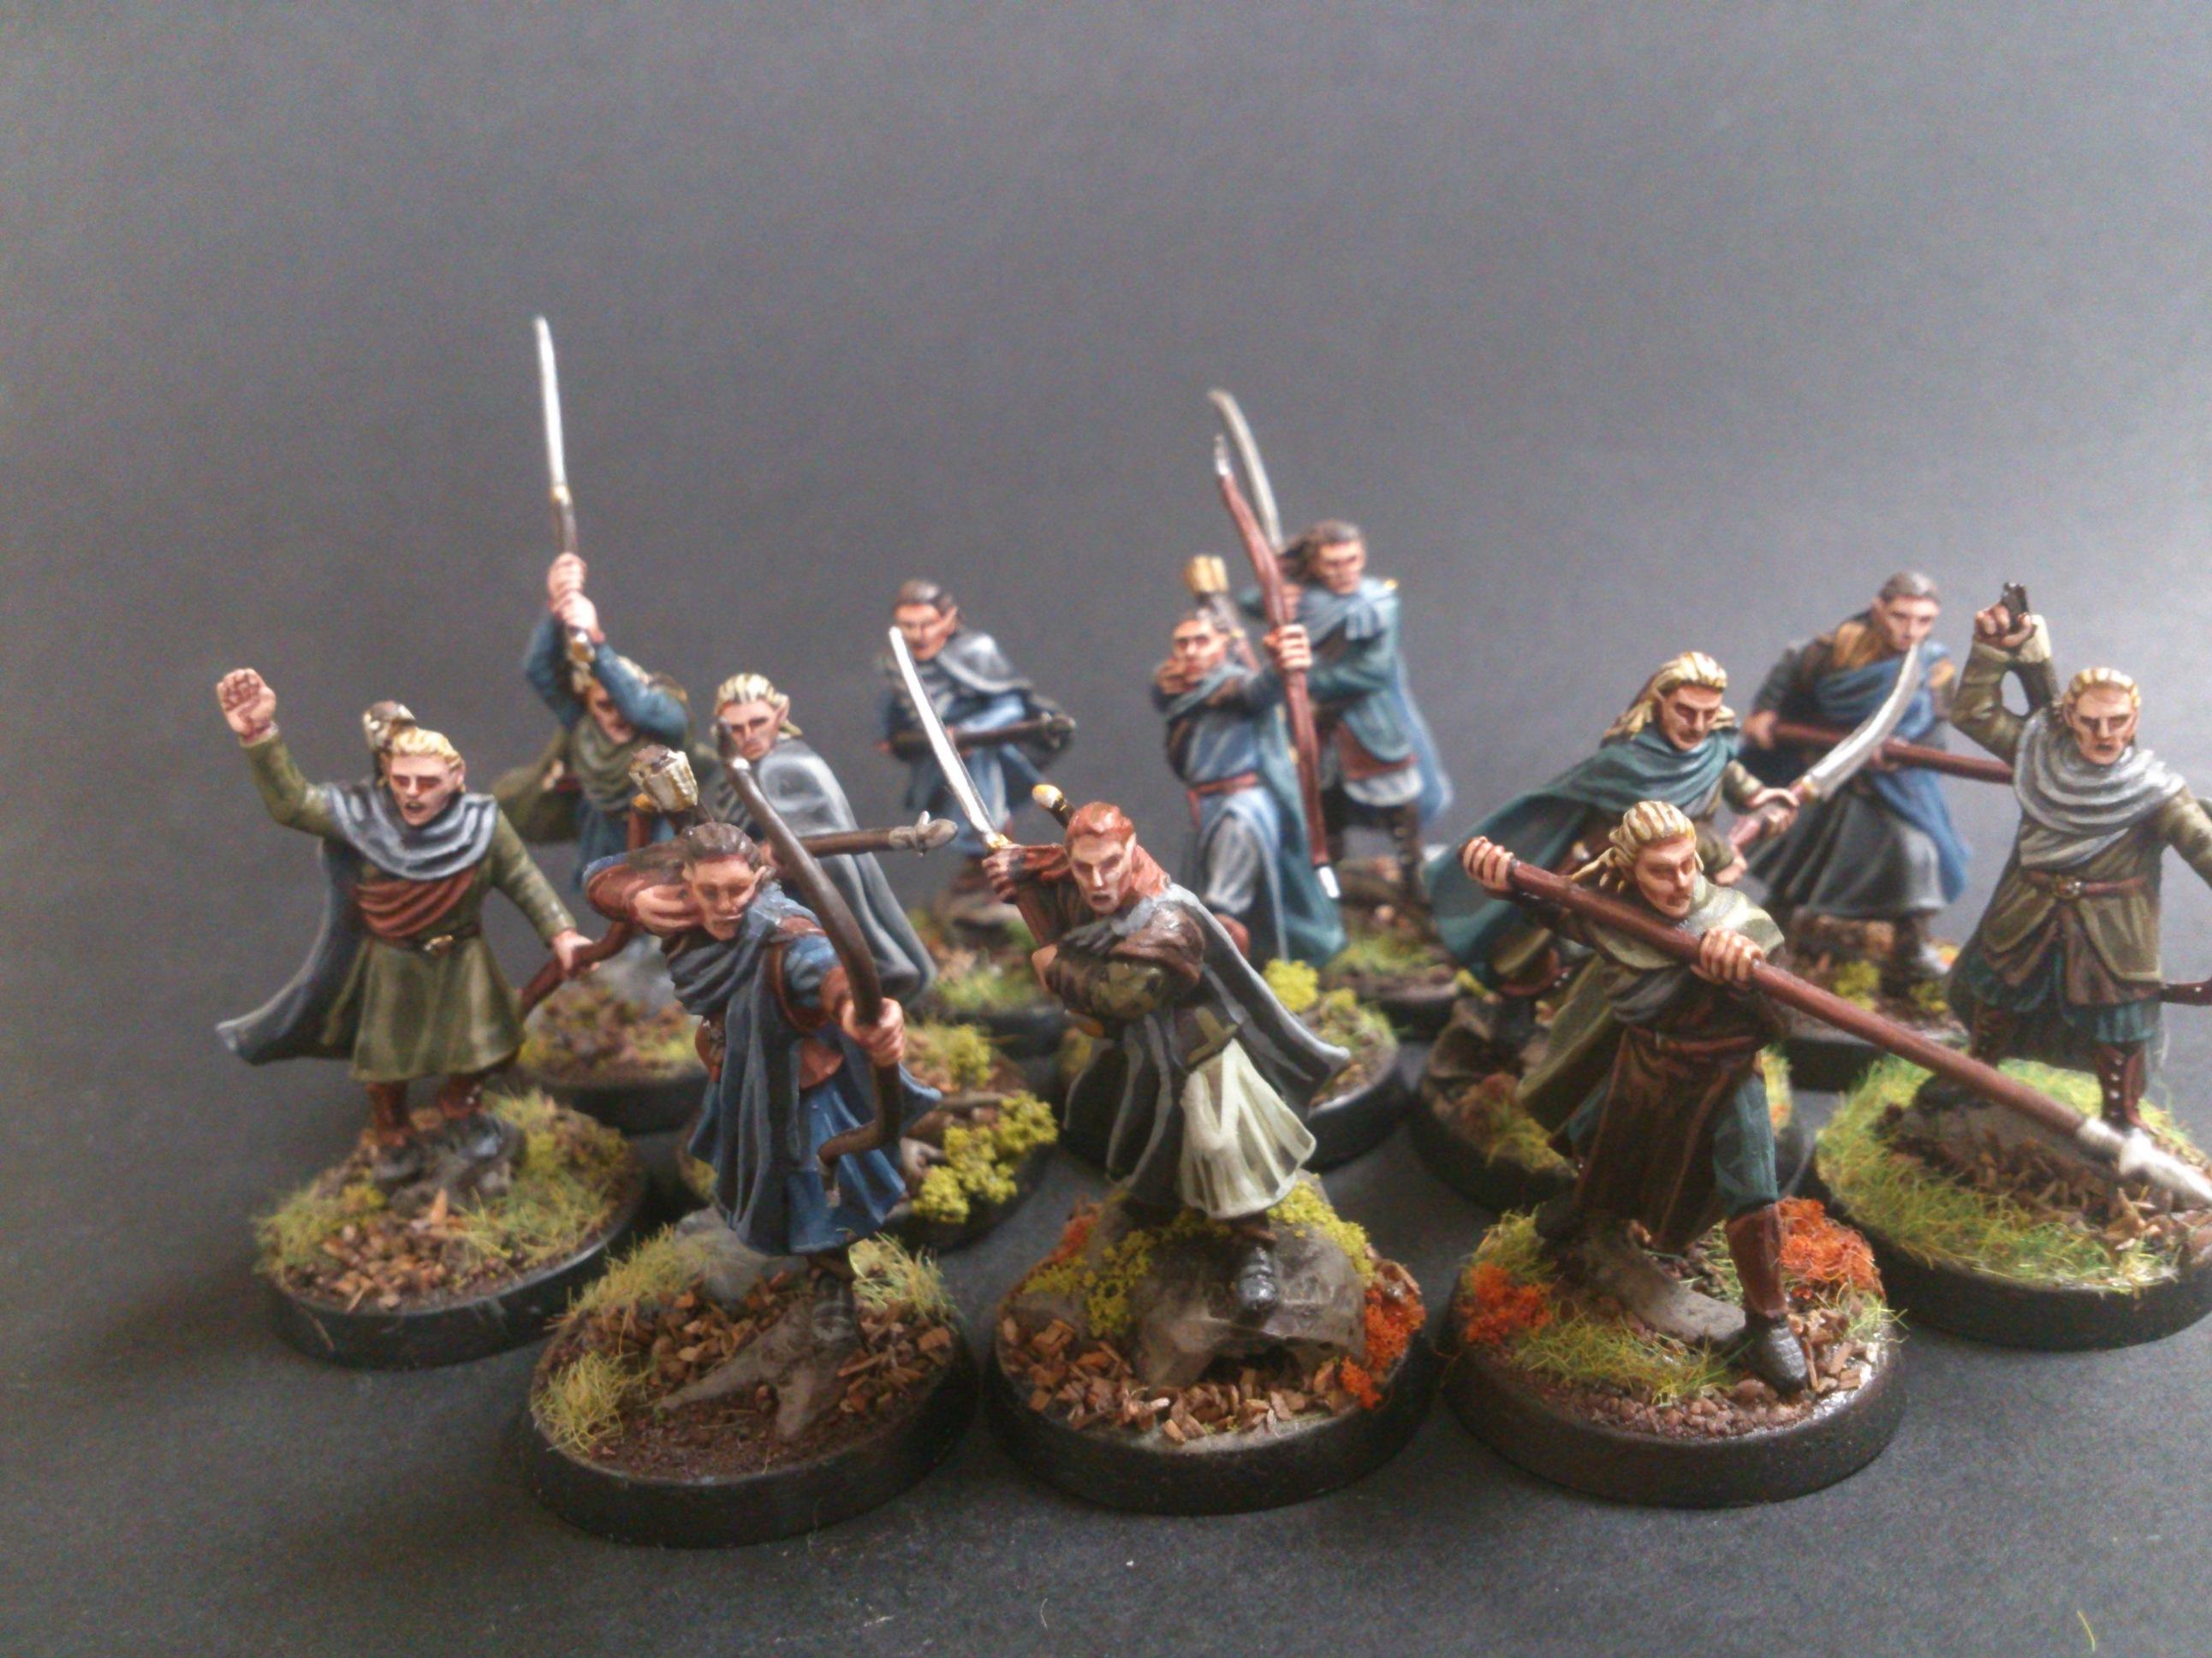 Coolminiornot Wood Elves Lotr Hobbit By Gene Parmesan